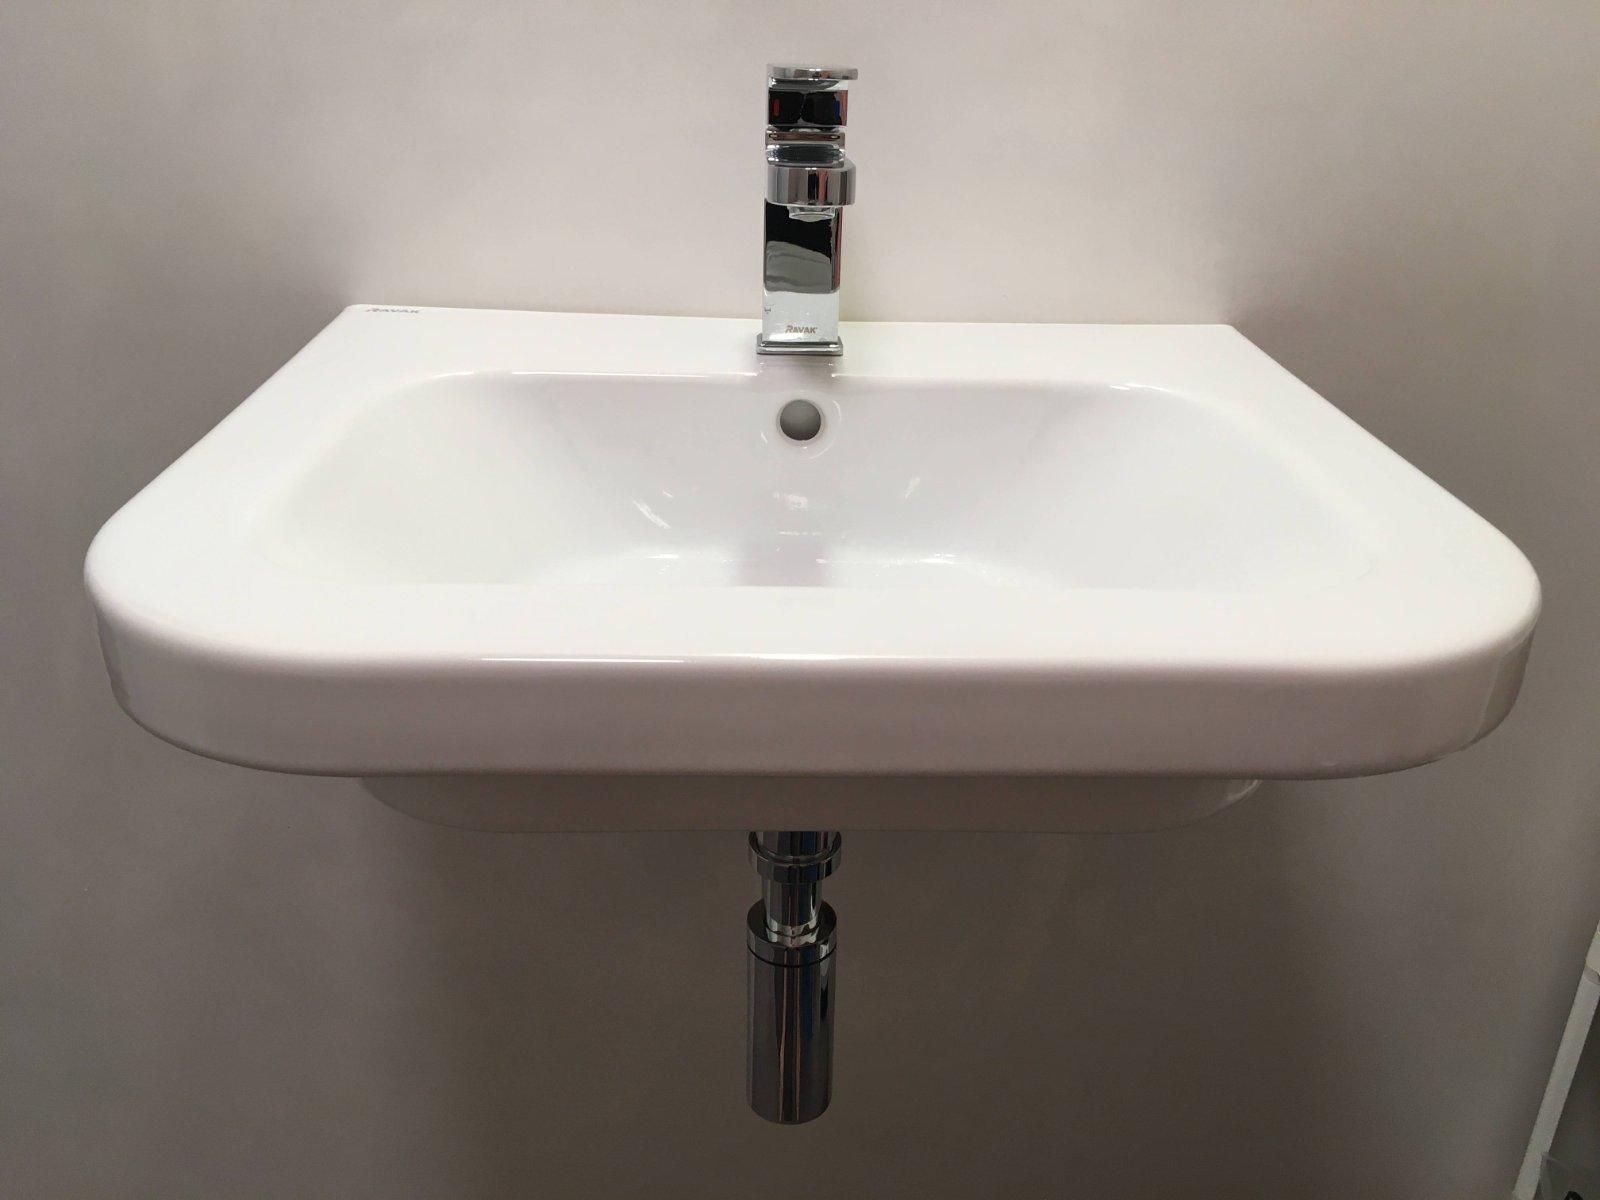 Umývadlo RAVAK - Obrázok č. 1